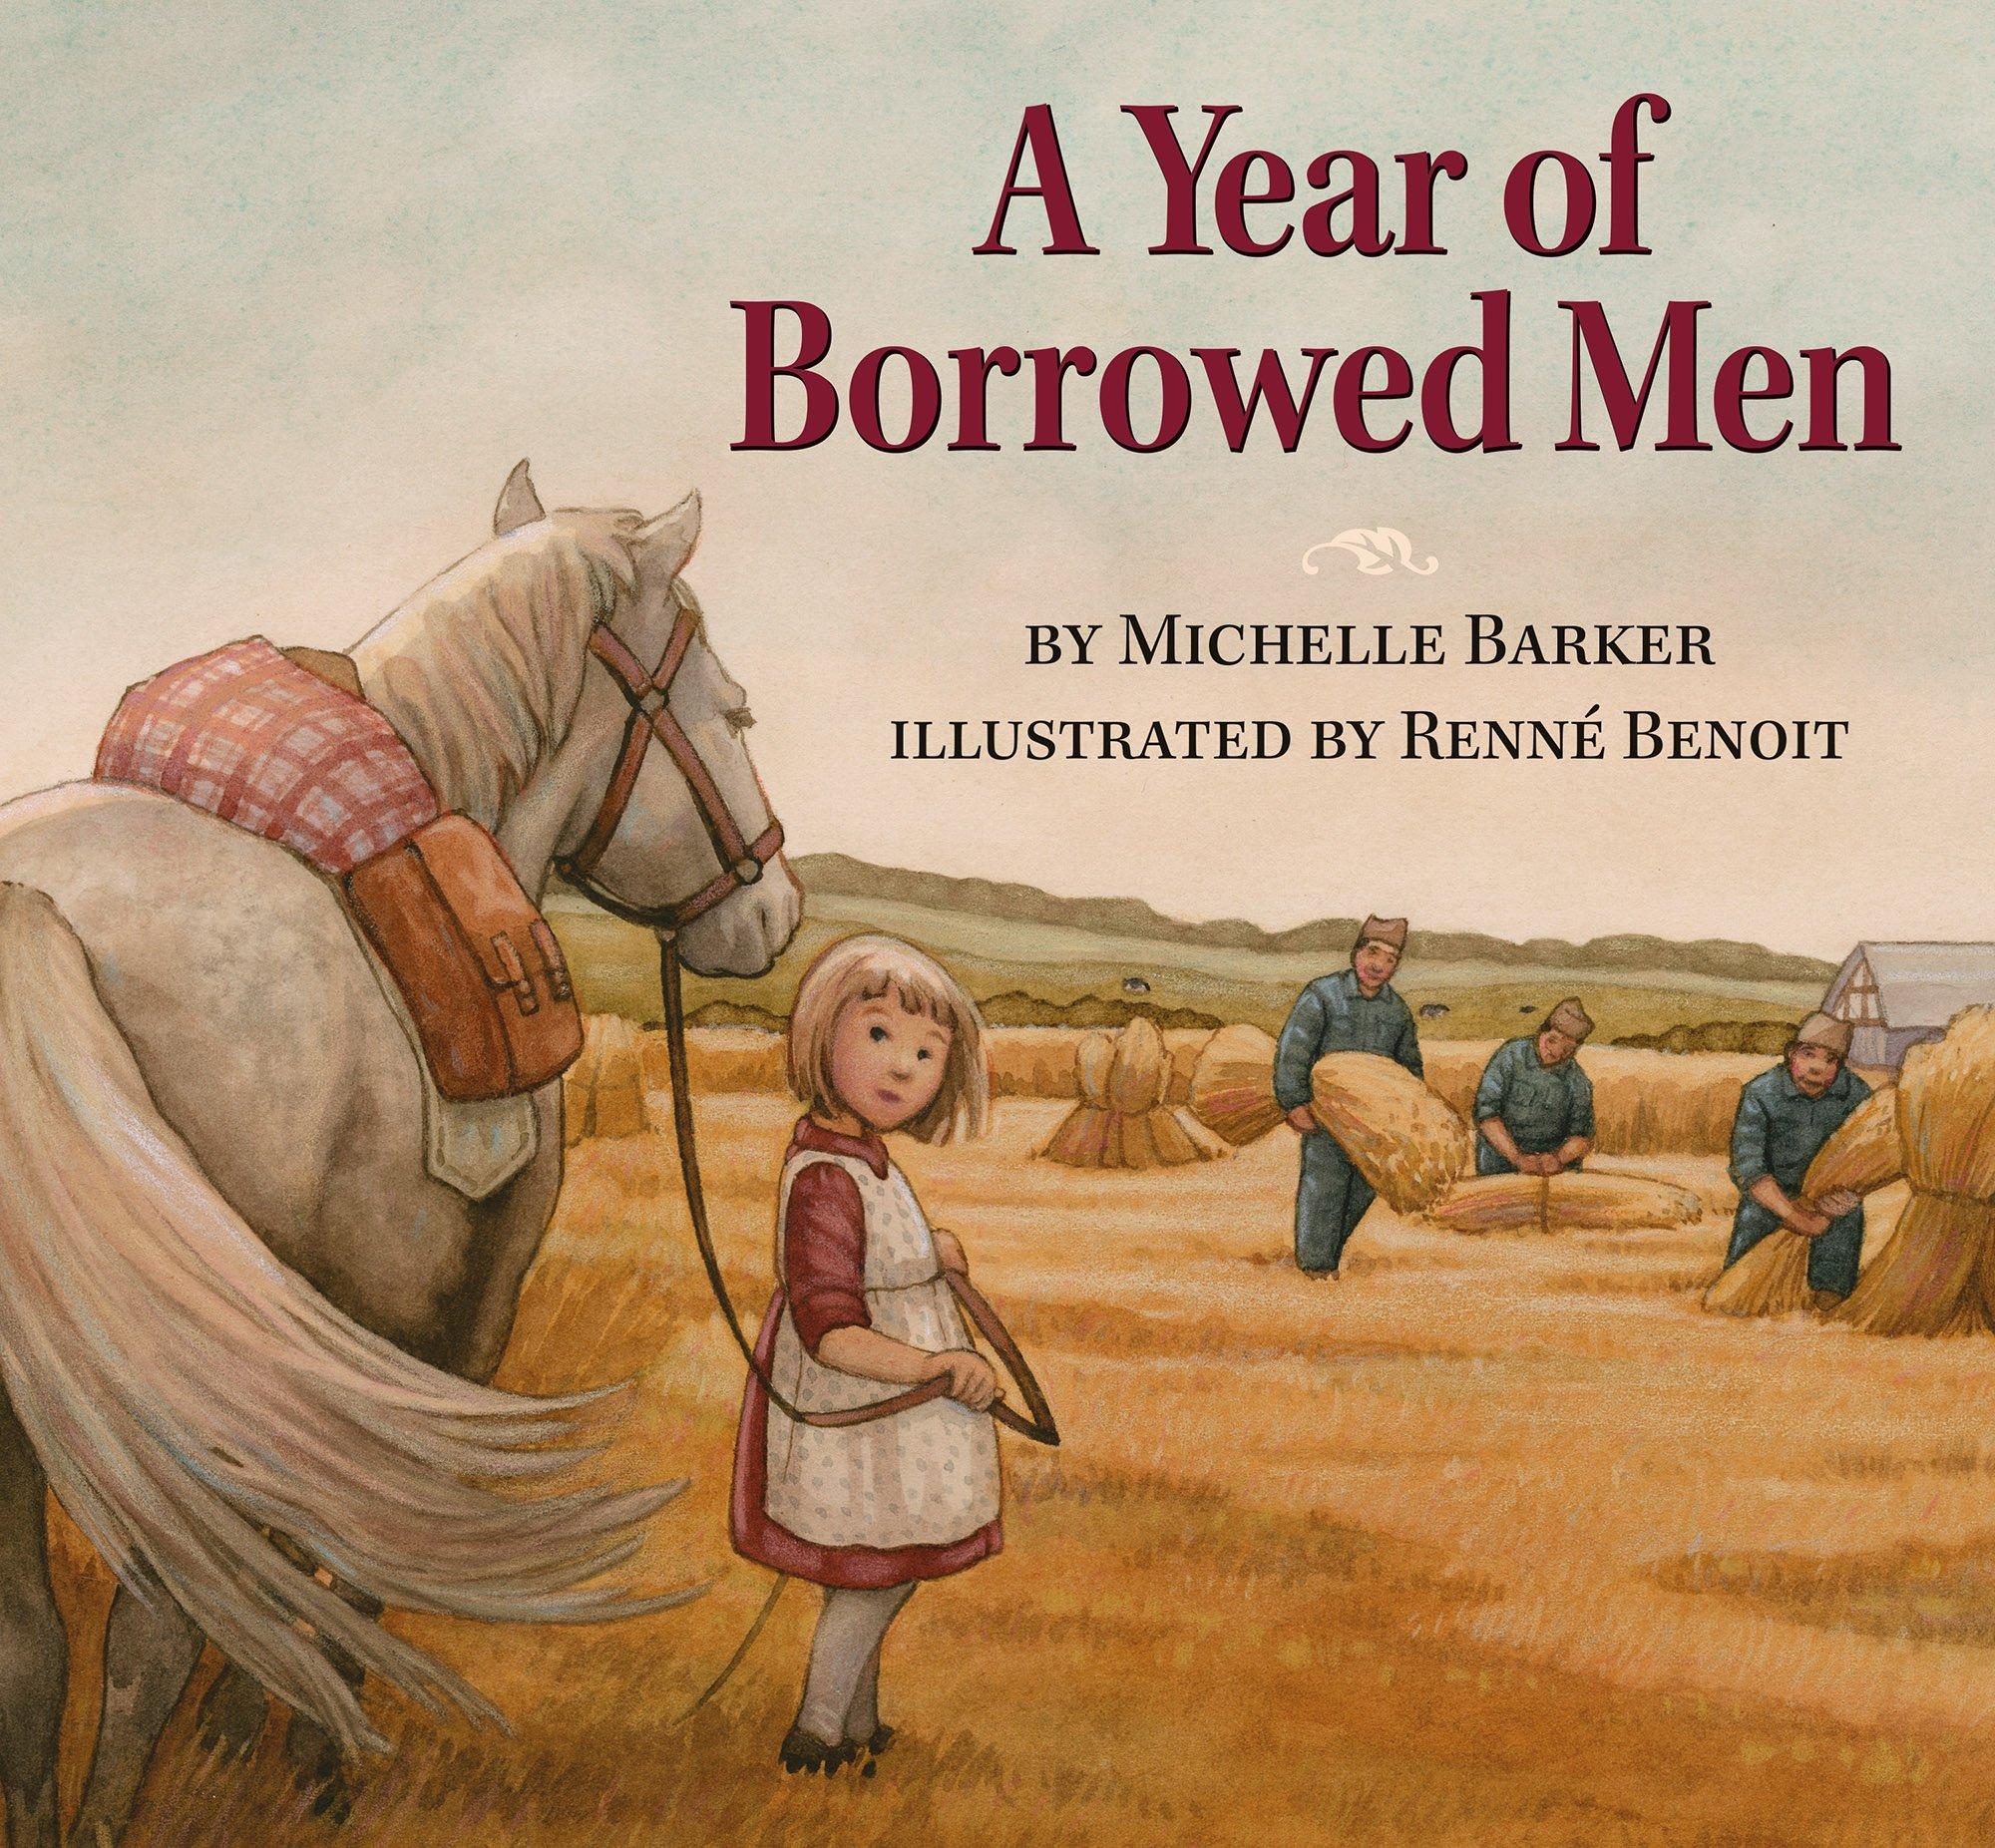 BorrowedMen